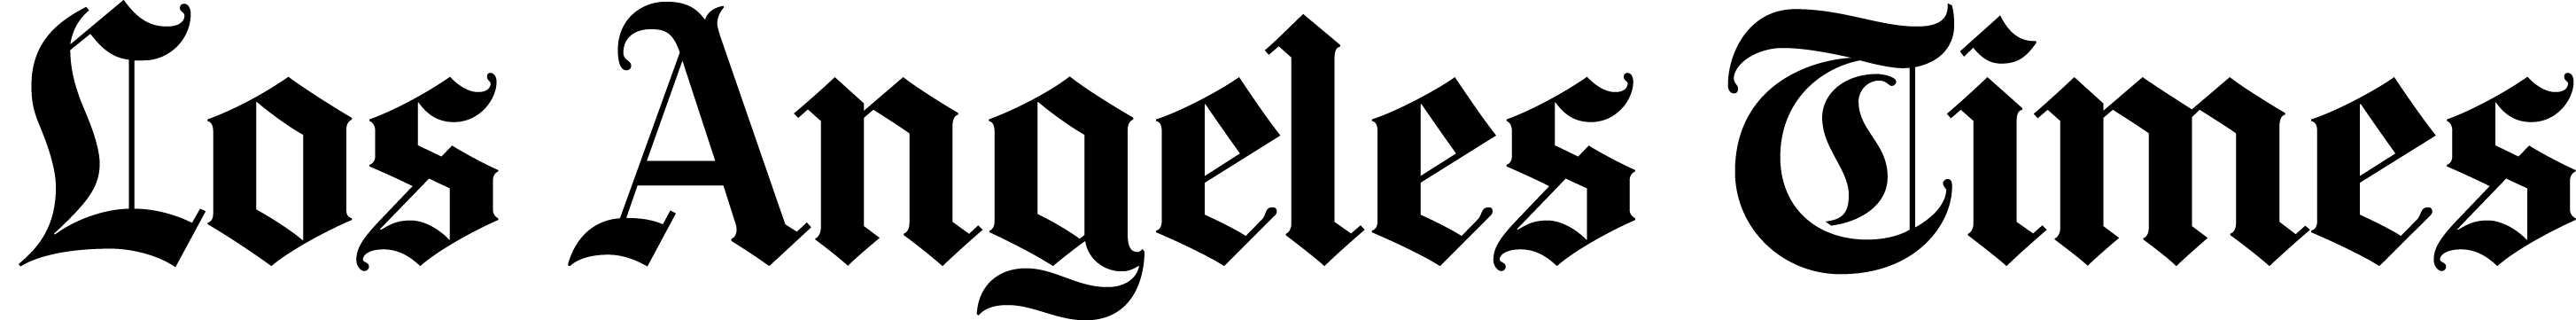 15LAT_Core_logo.png